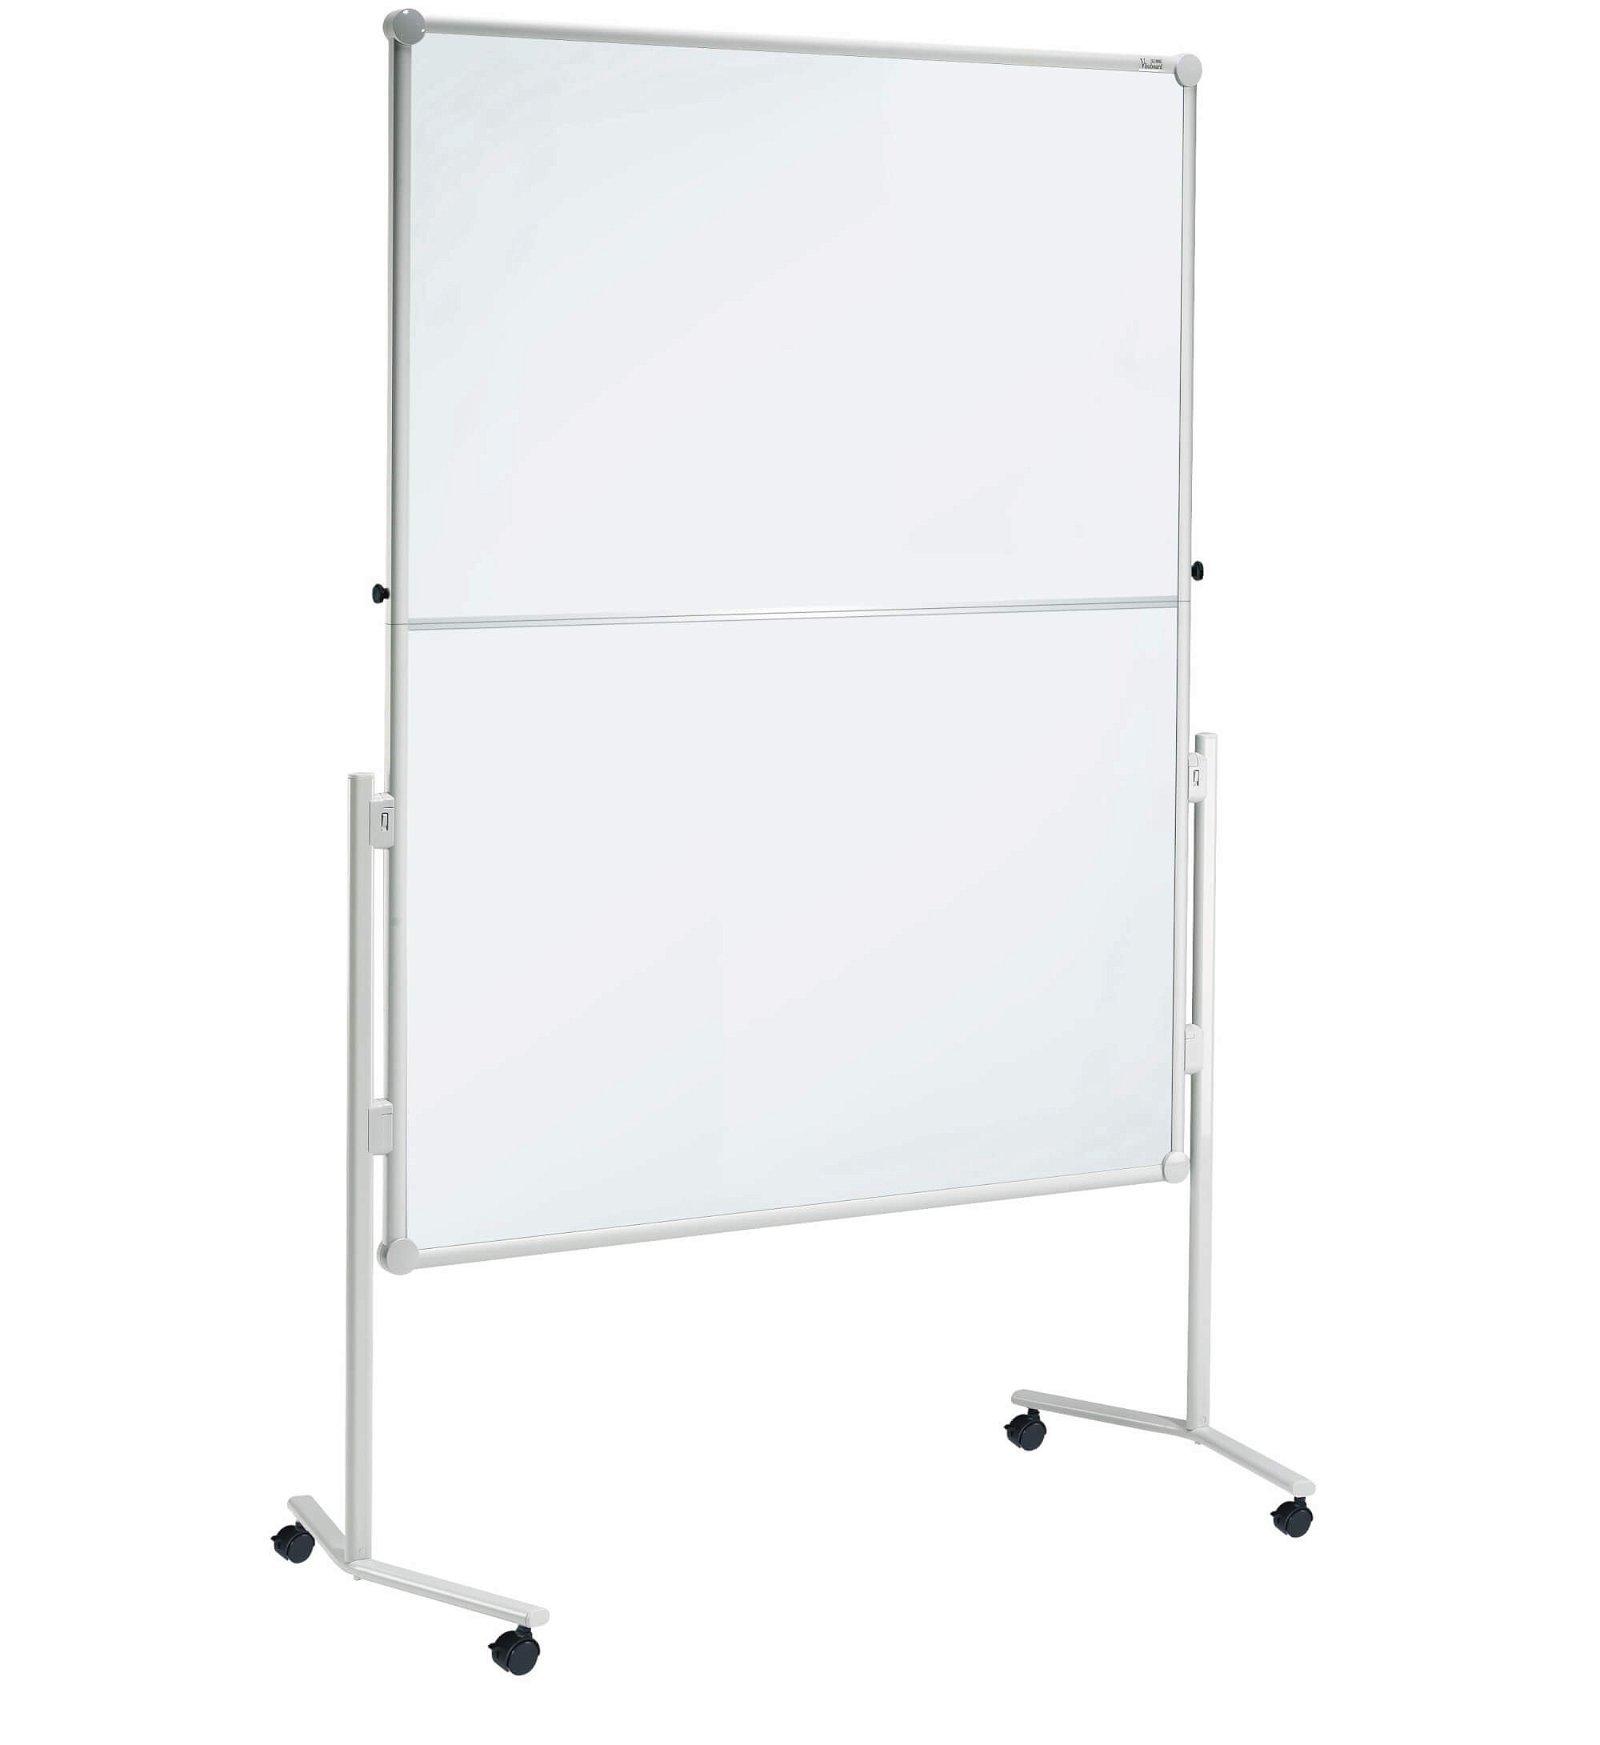 Moderationstafel MAULpro klappb. Textil/WB, 150x120 cm, grau